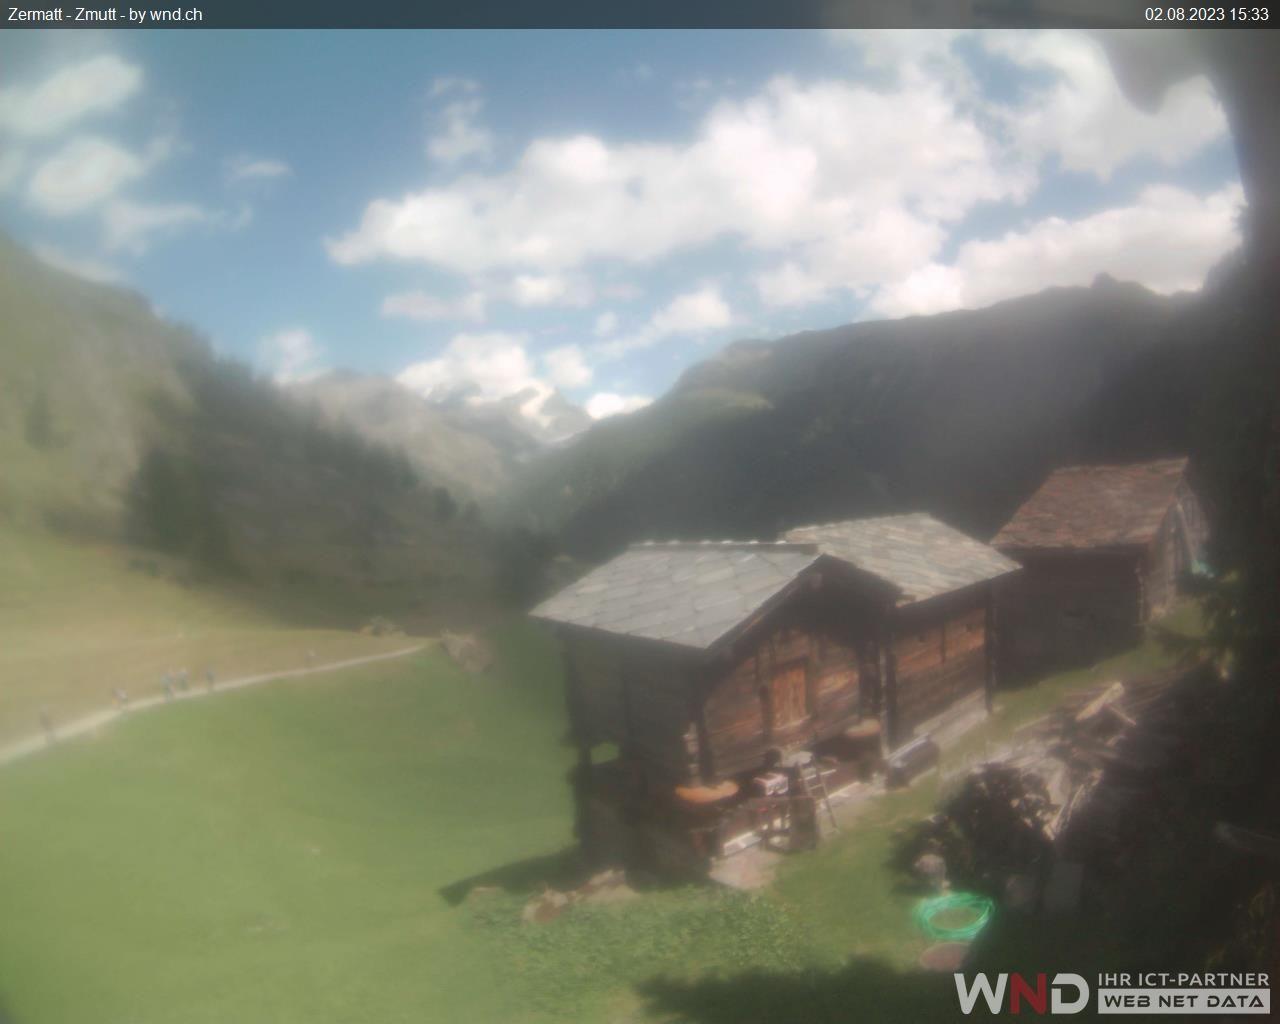 Blatten › Norden: Zermatt, Zmutt